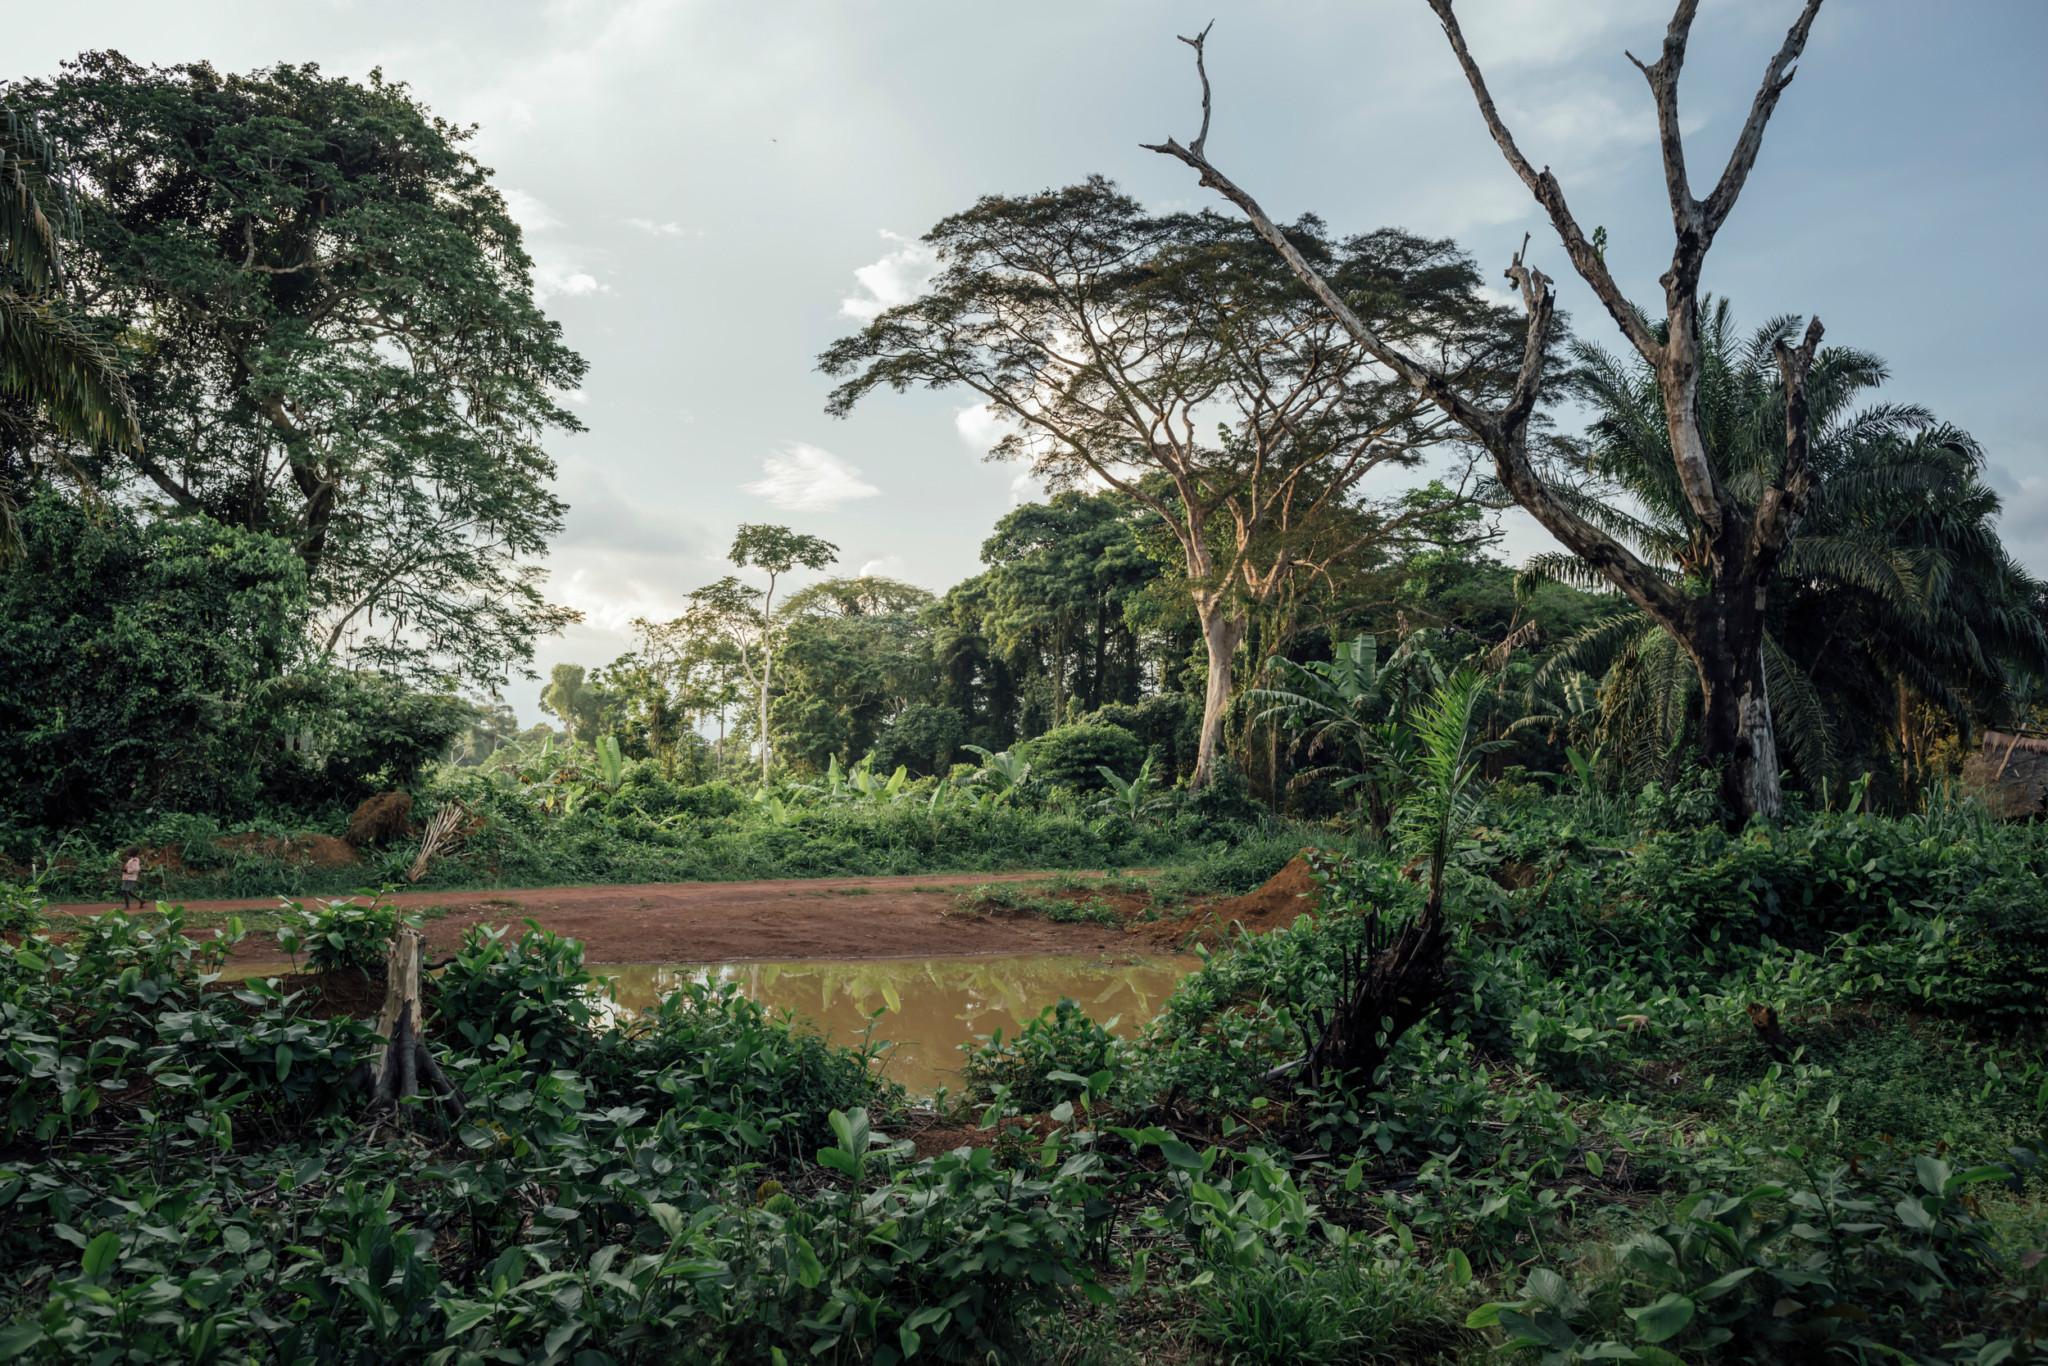 The village of Lokolama at sunset. © Kevin McElvaney / Greenpeace